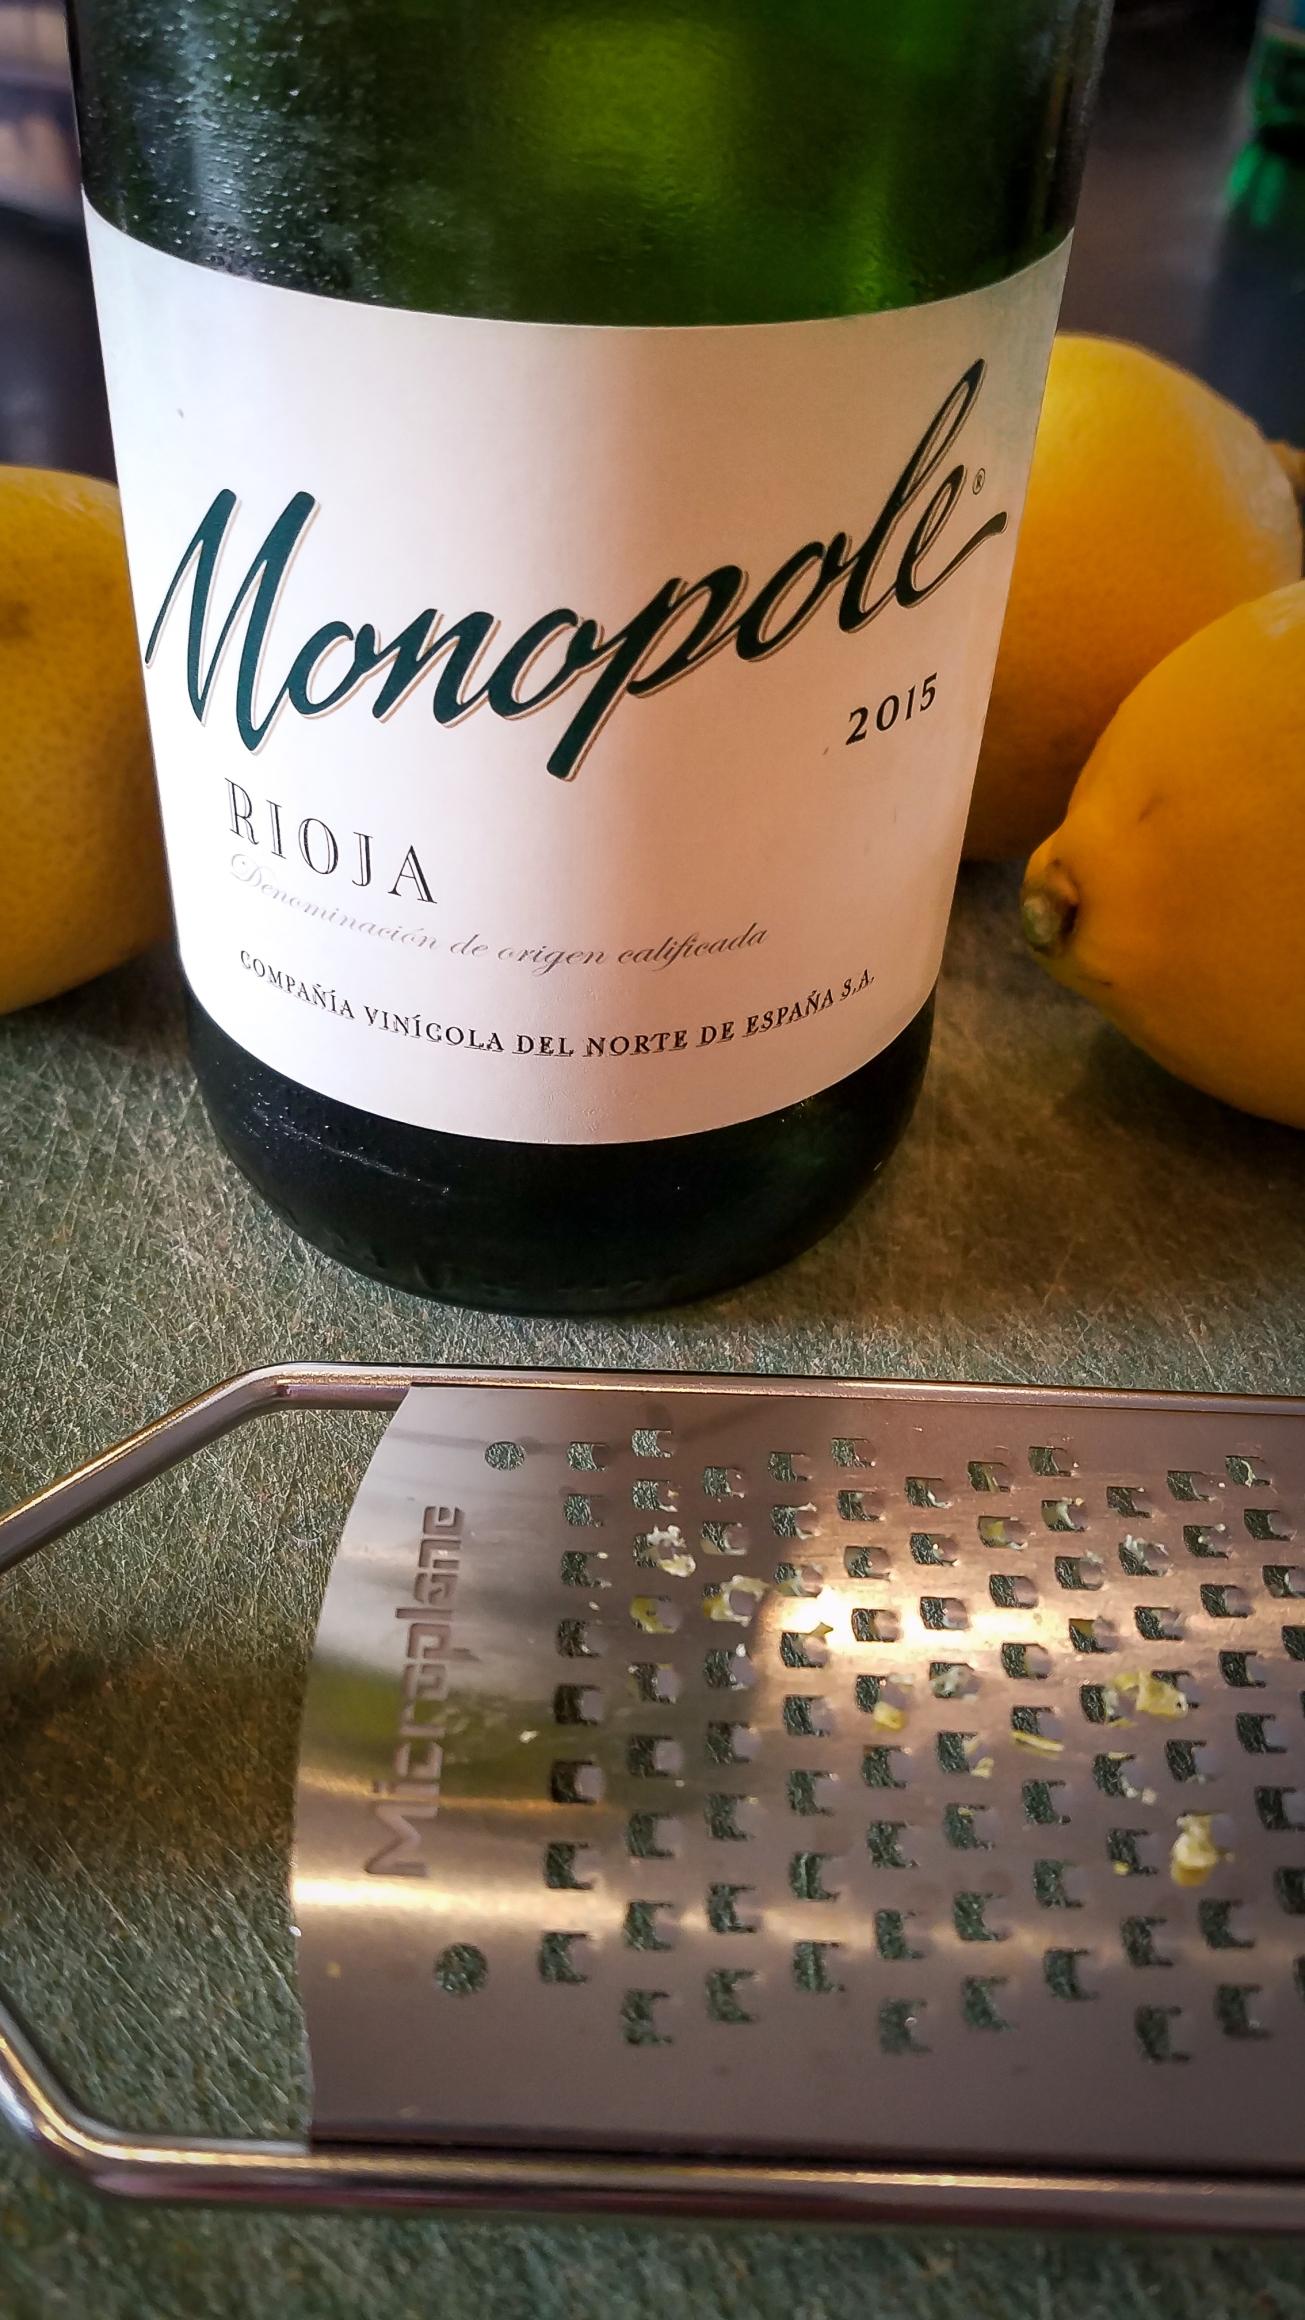 2015 C.V.N.E. (Compañía Vinícola del Norte de España) Rioja Monopole Blanco